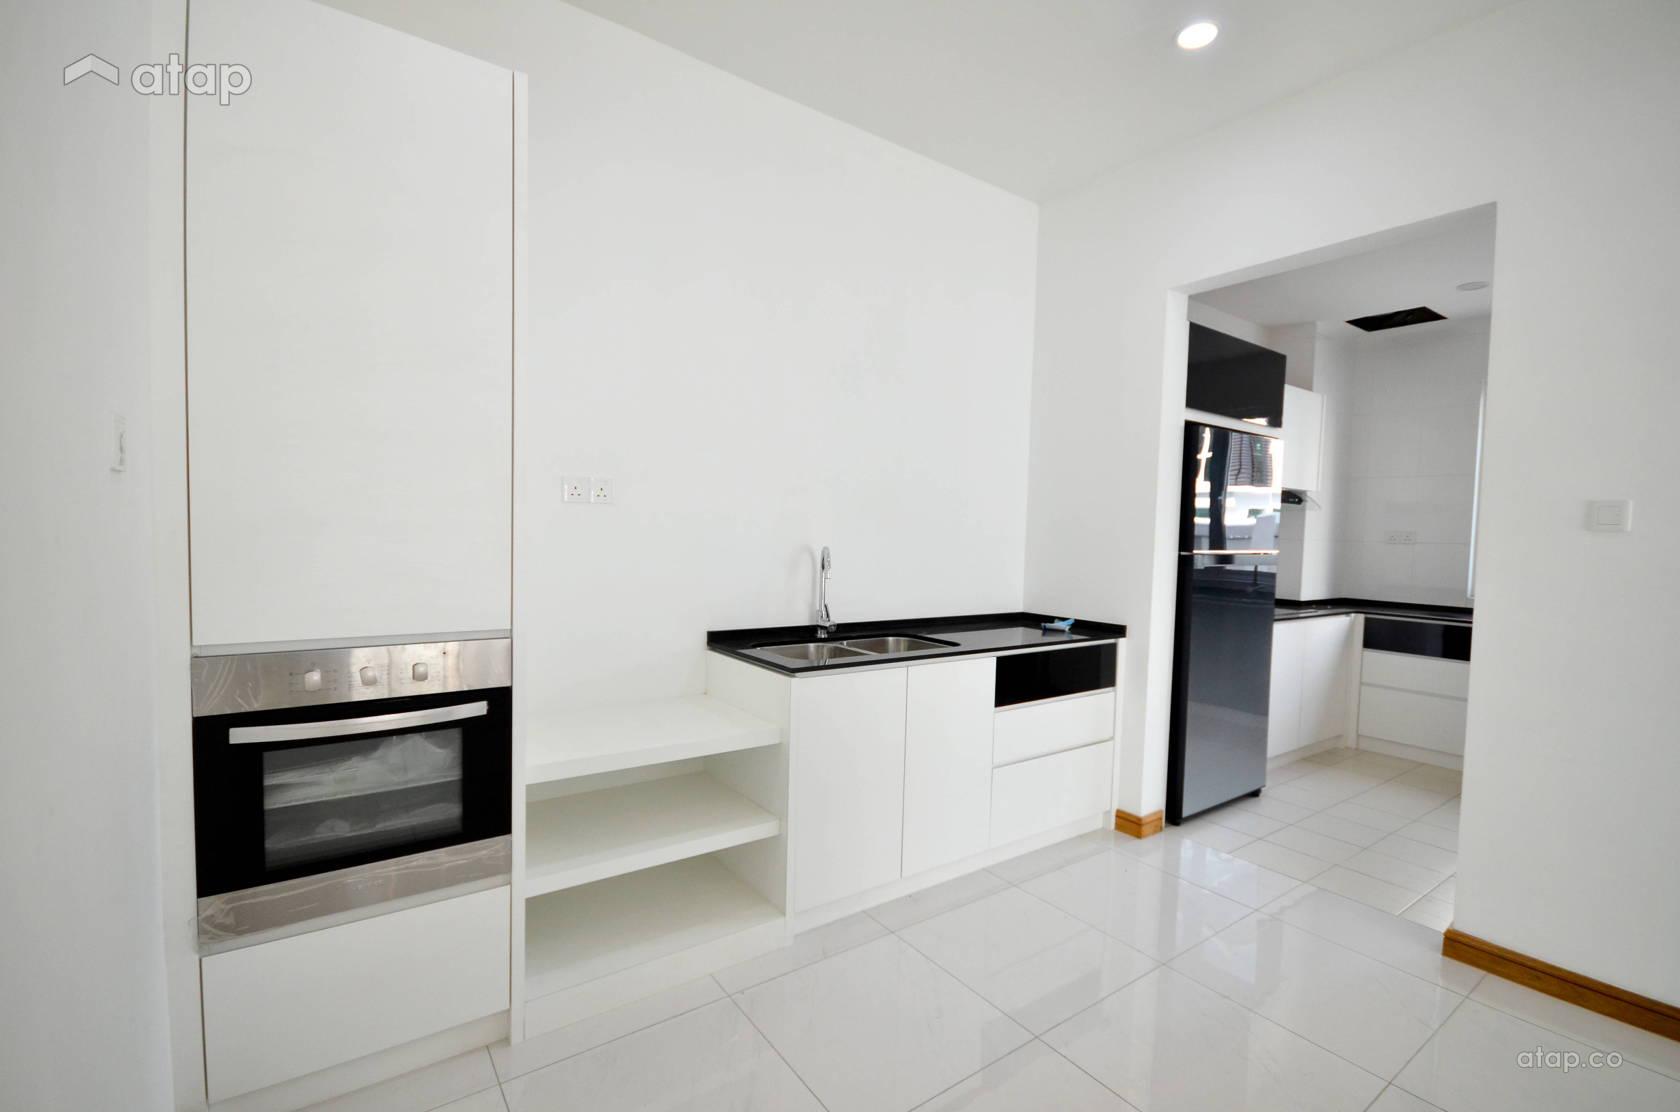 tropicana indah interior design renovation ideas photos and price 1 6